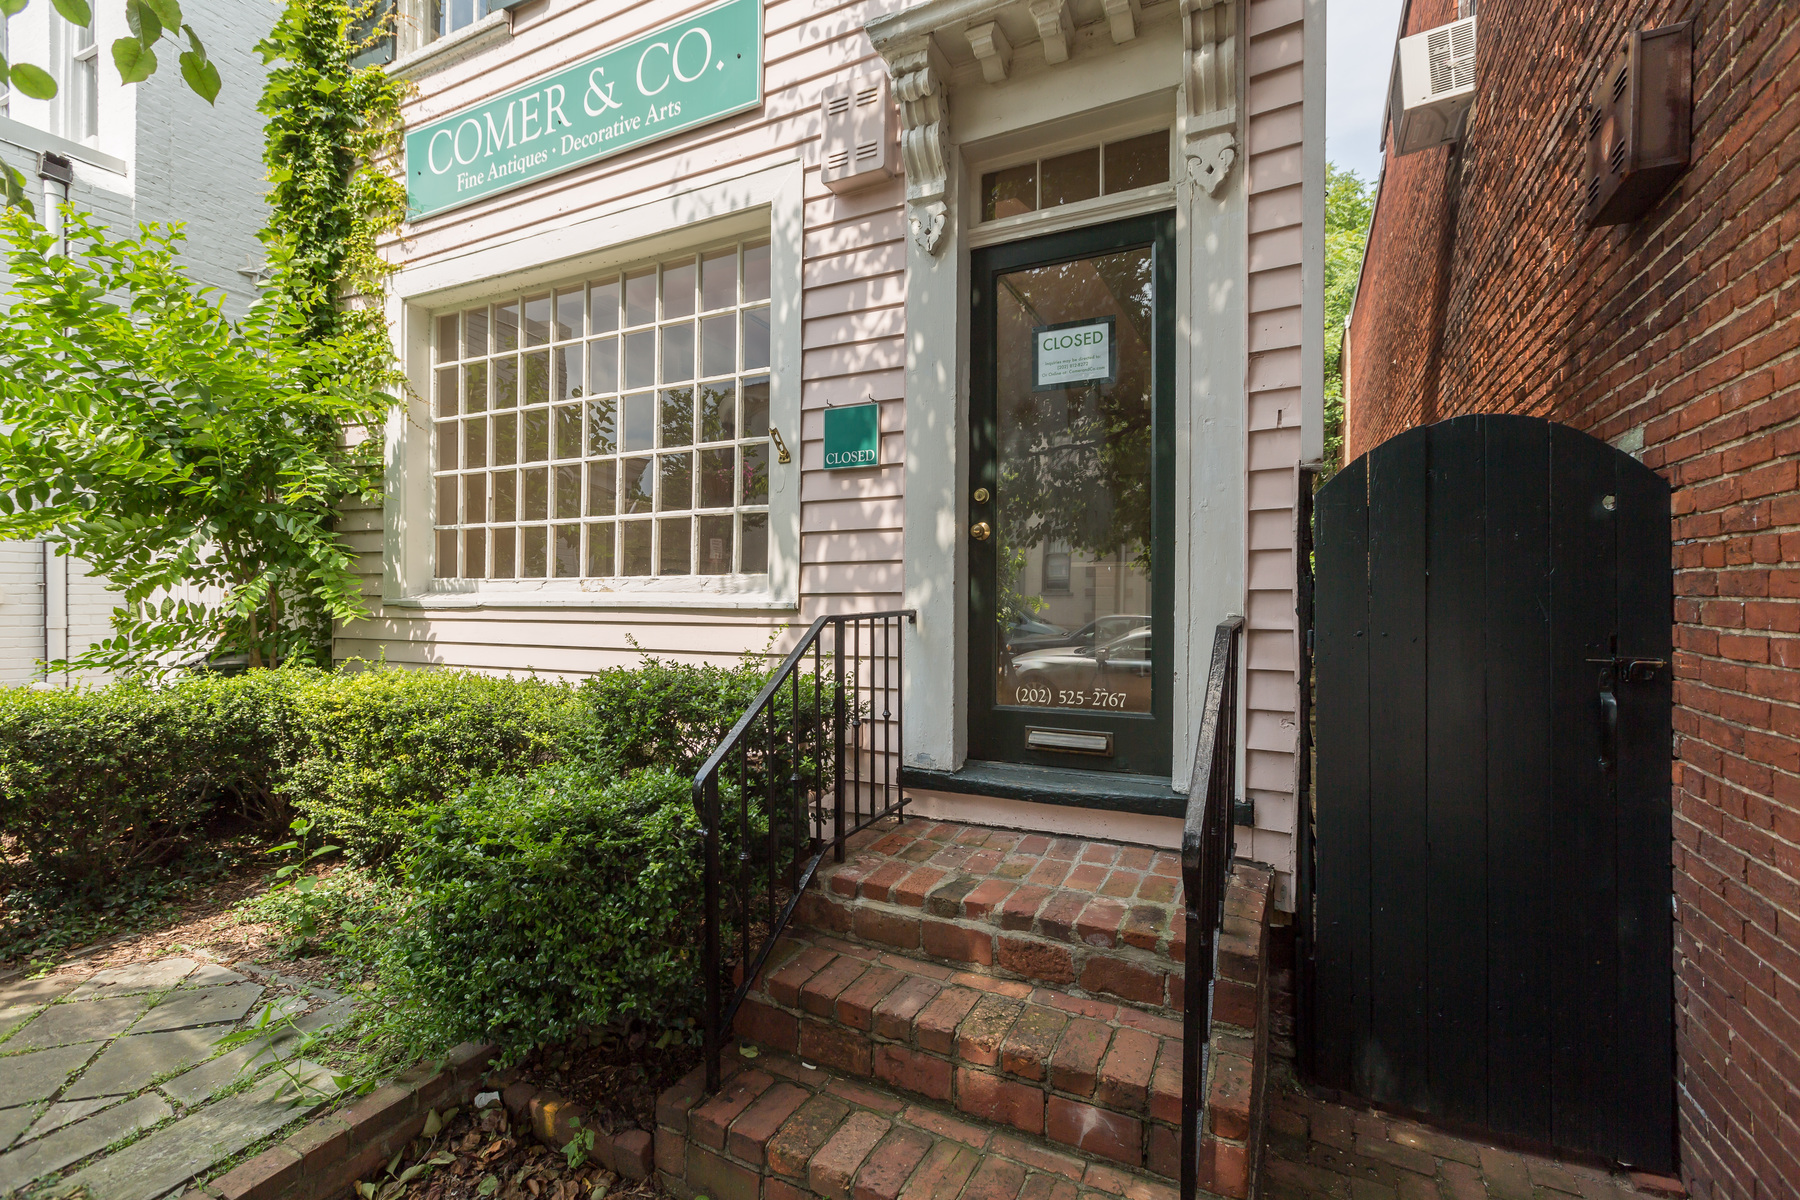 sales property at 1659 Wisconsin Ave NW, Washington